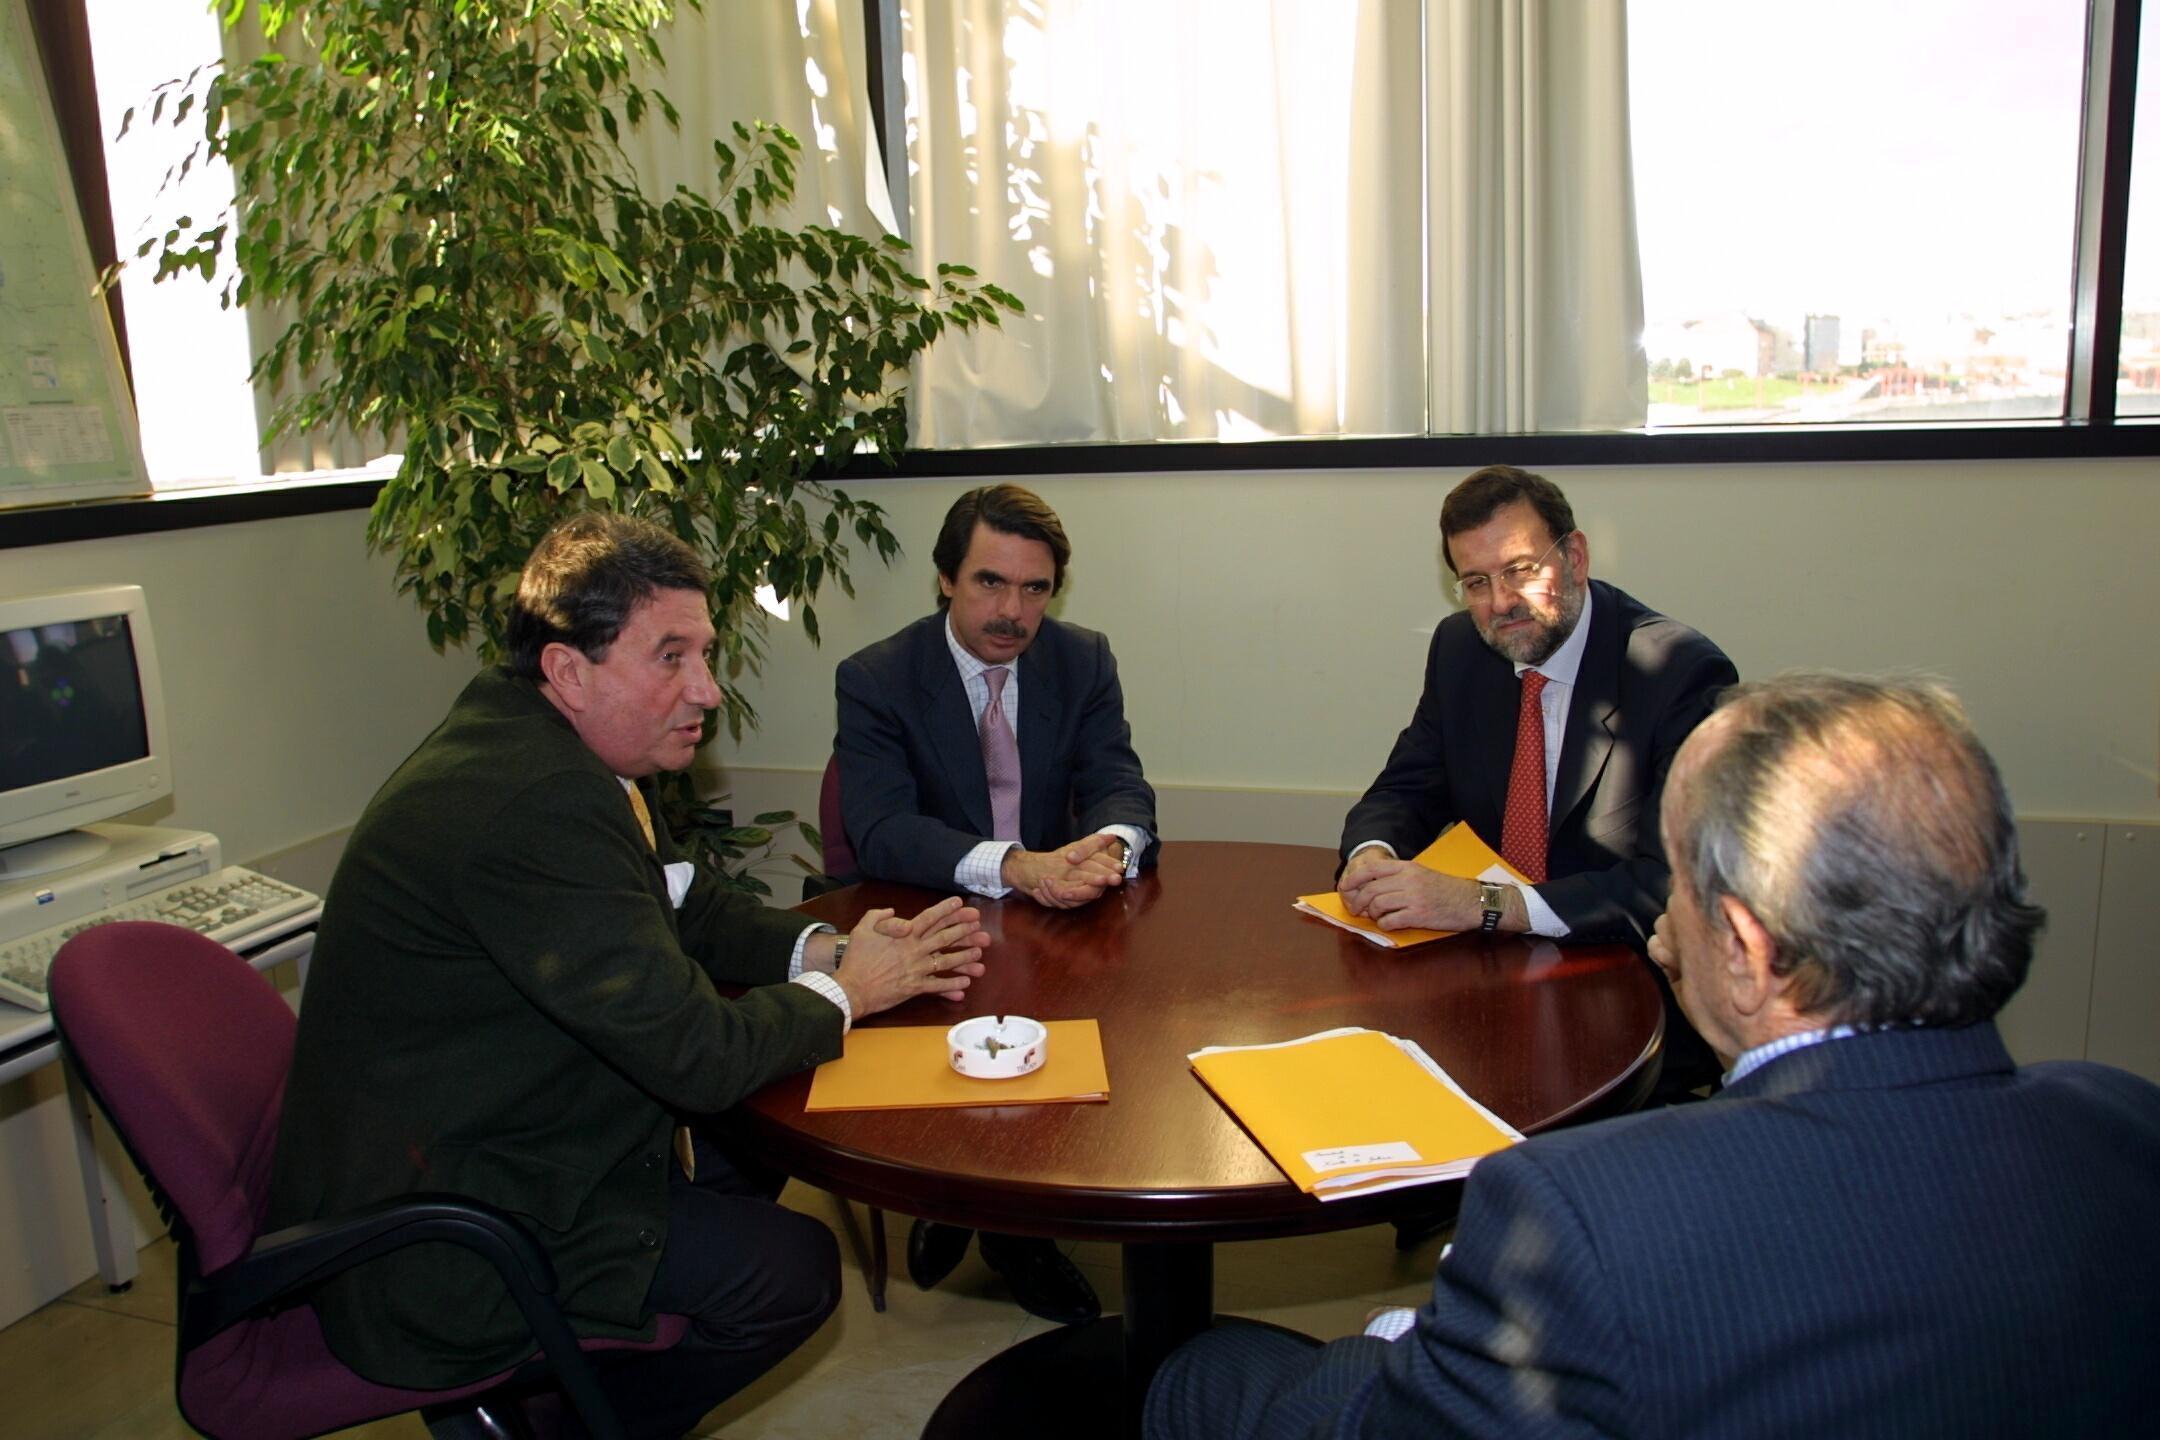 Francisco Vázquez, Aznar, Rajoy y Fraga, reunidos. <br> <b>Xosé Castro. </b>